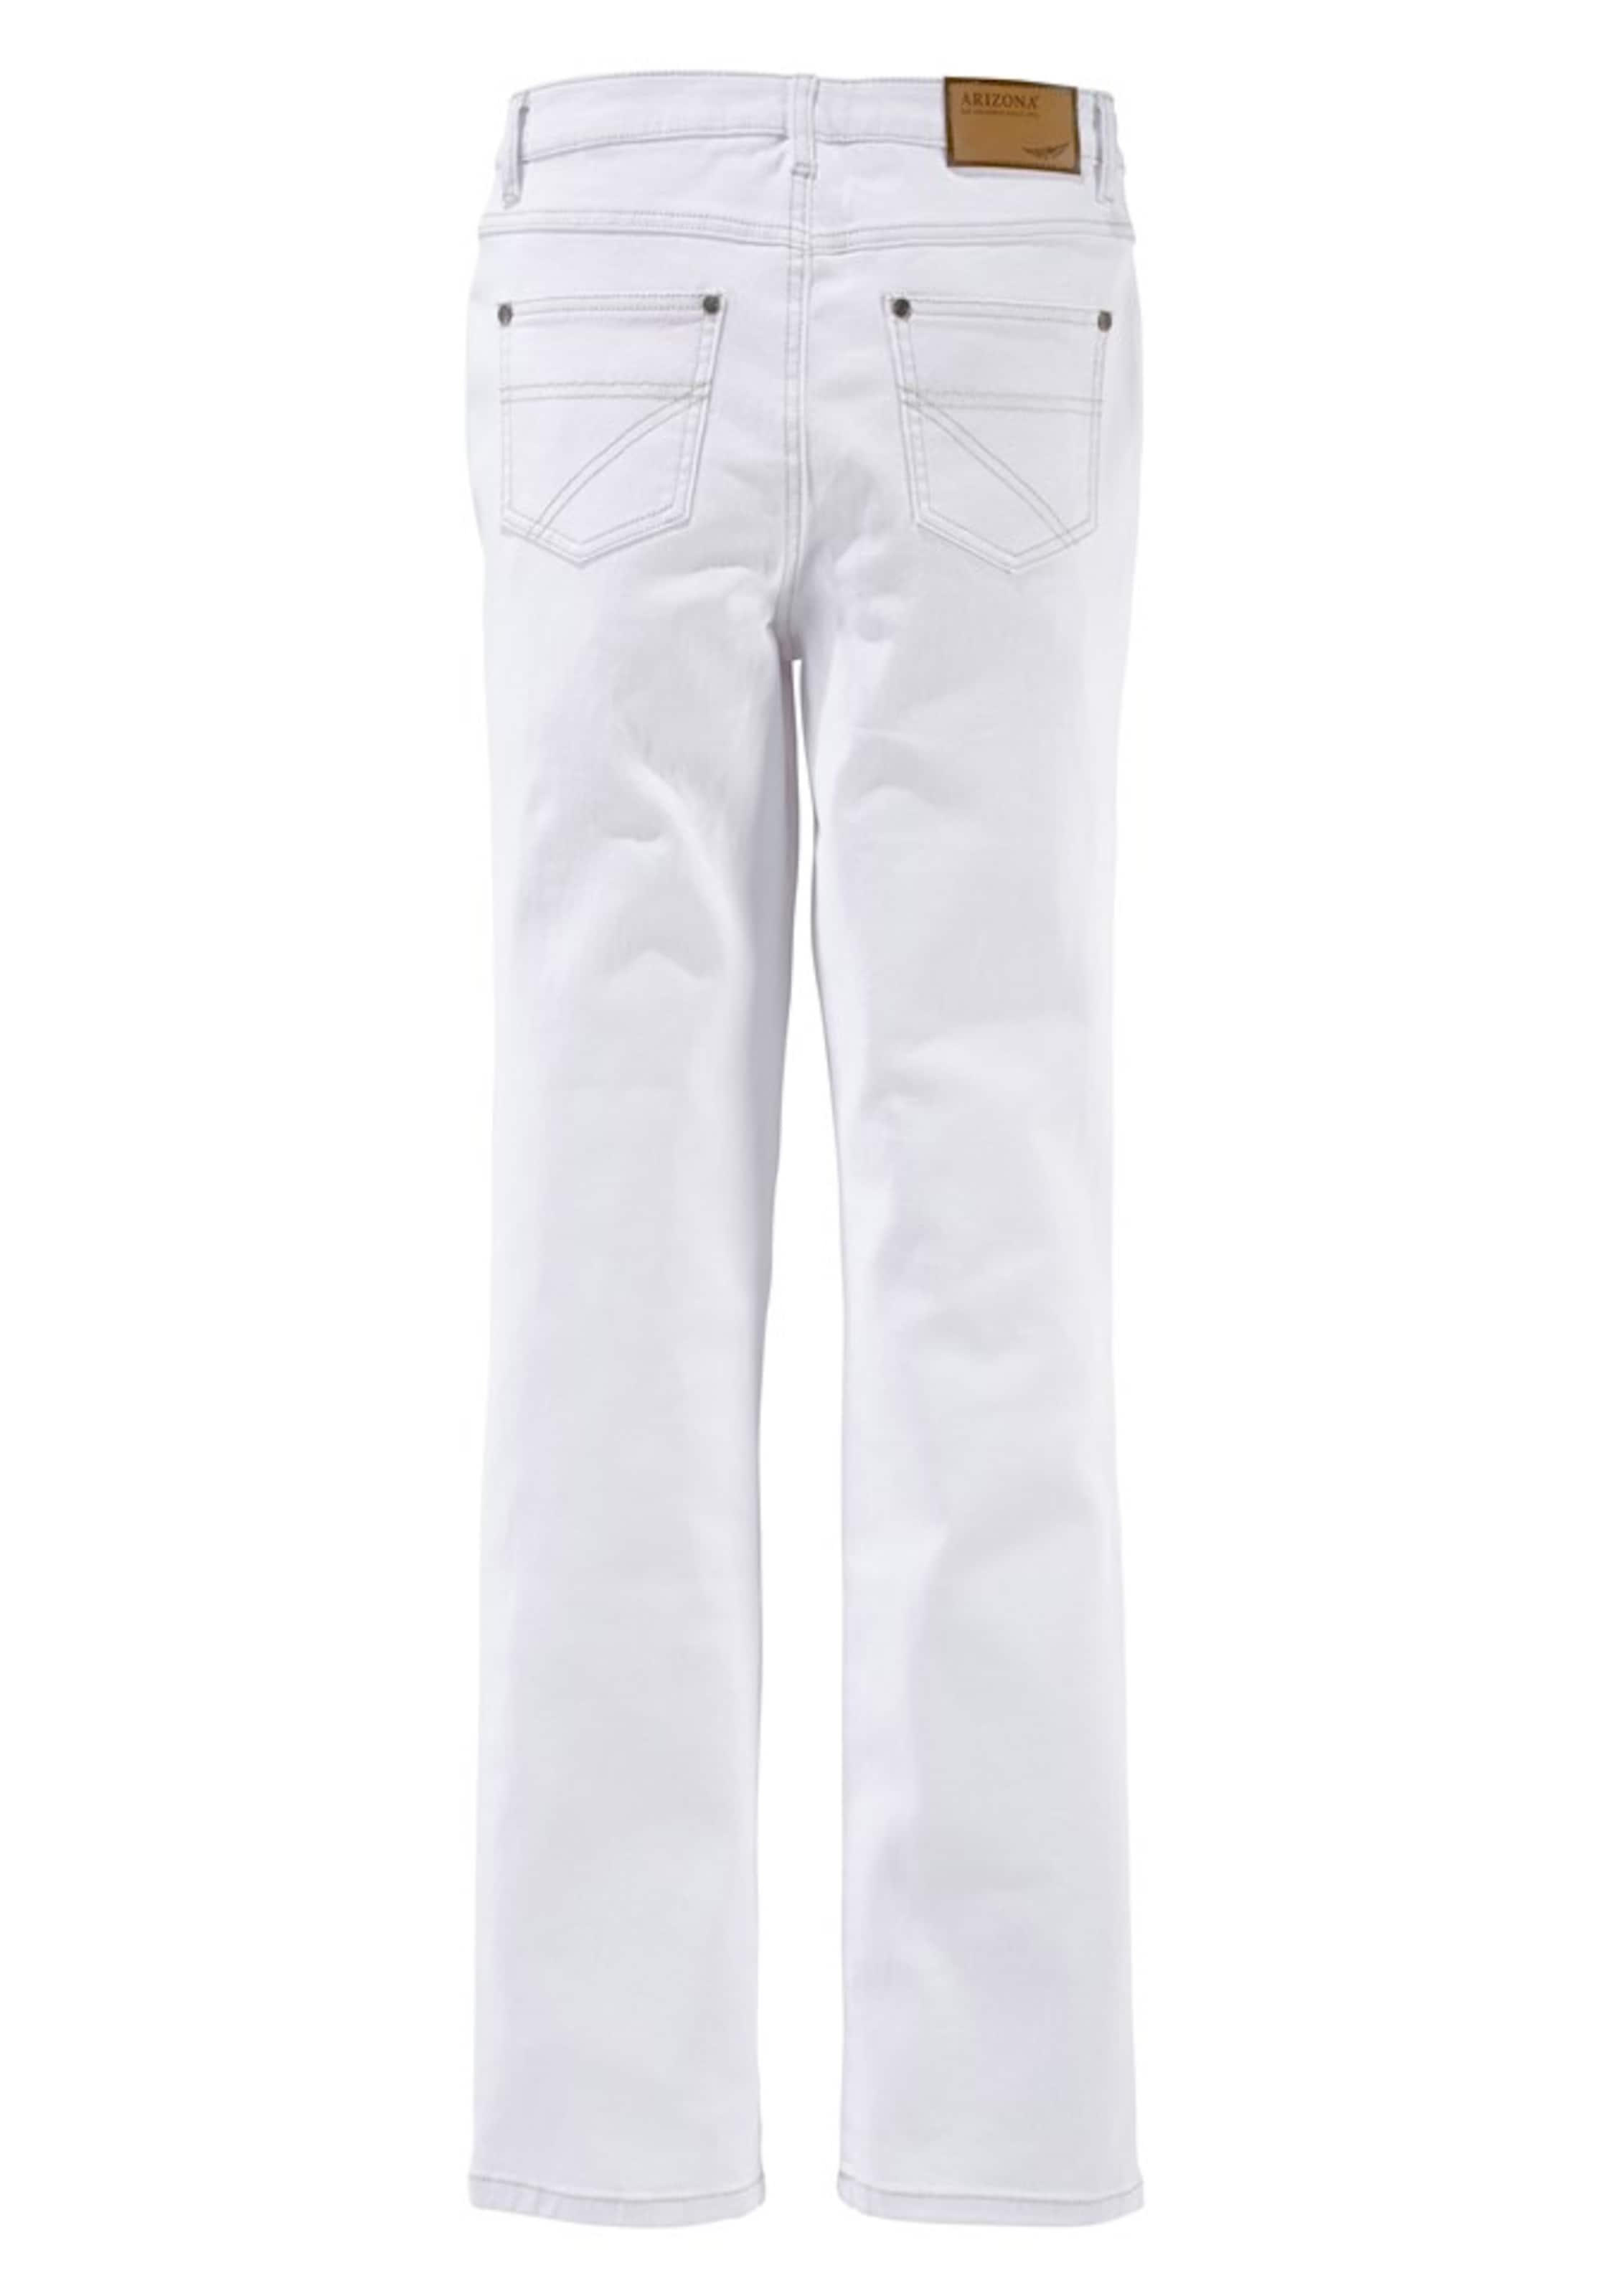 Jeans Arizona In Weiß Weiß Jeans In In Arizona Weiß Arizona Jeans Arizona qMpSVUz